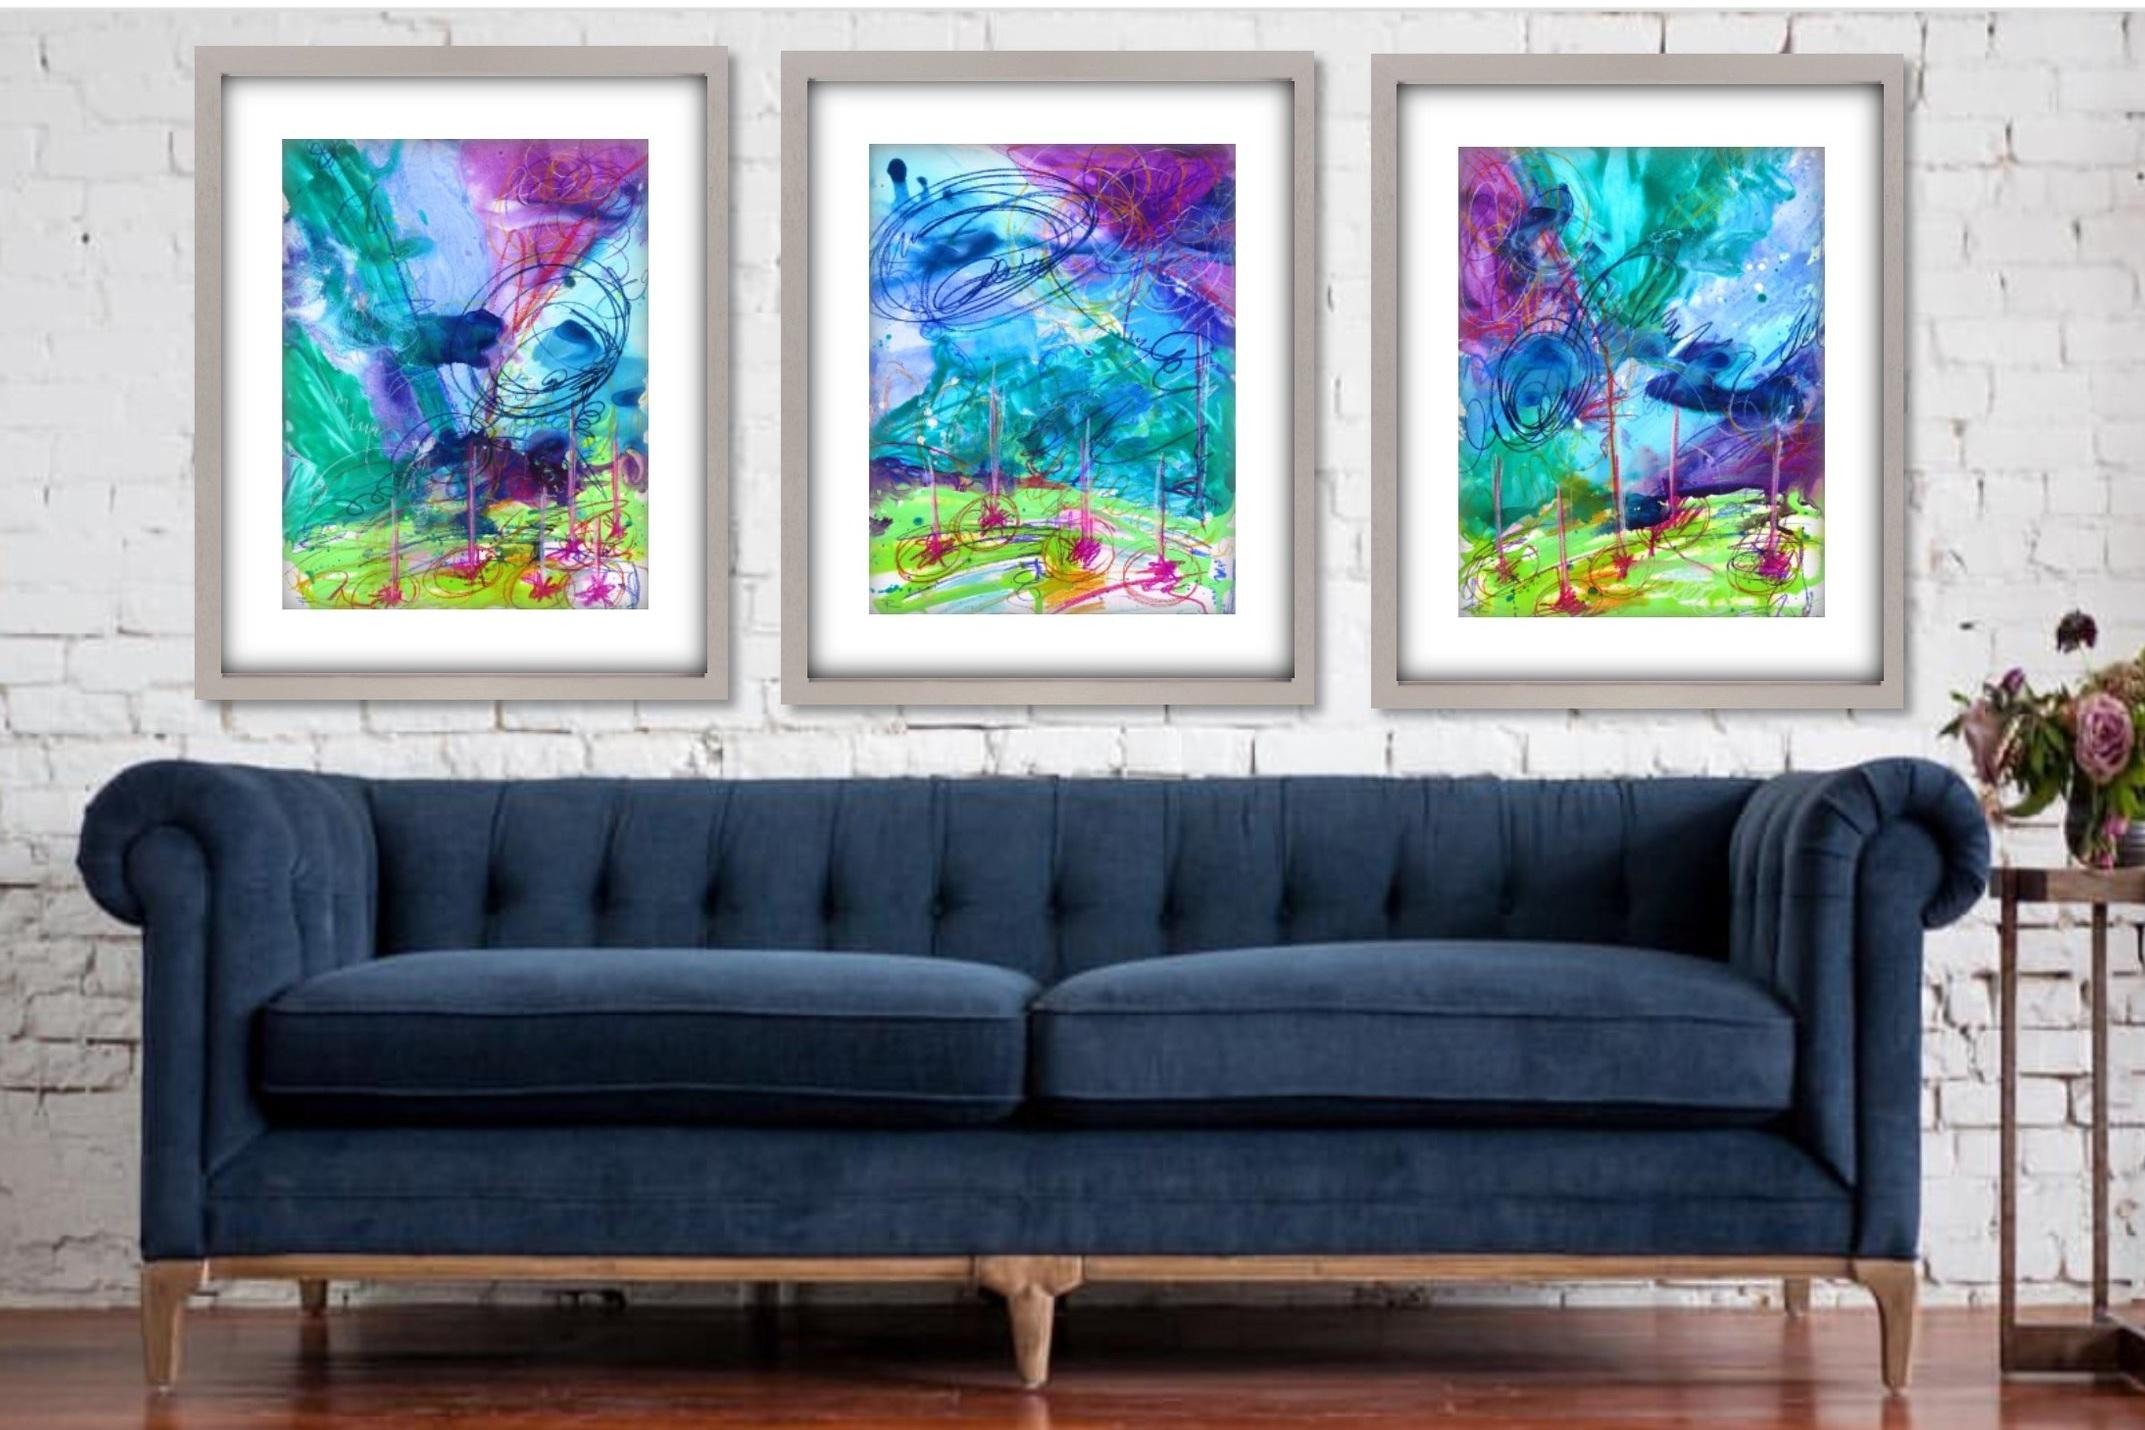 Summer Storm - 24 x 18 Mixed Media Original Art Work on 140lb Water Color Paper $425 Each